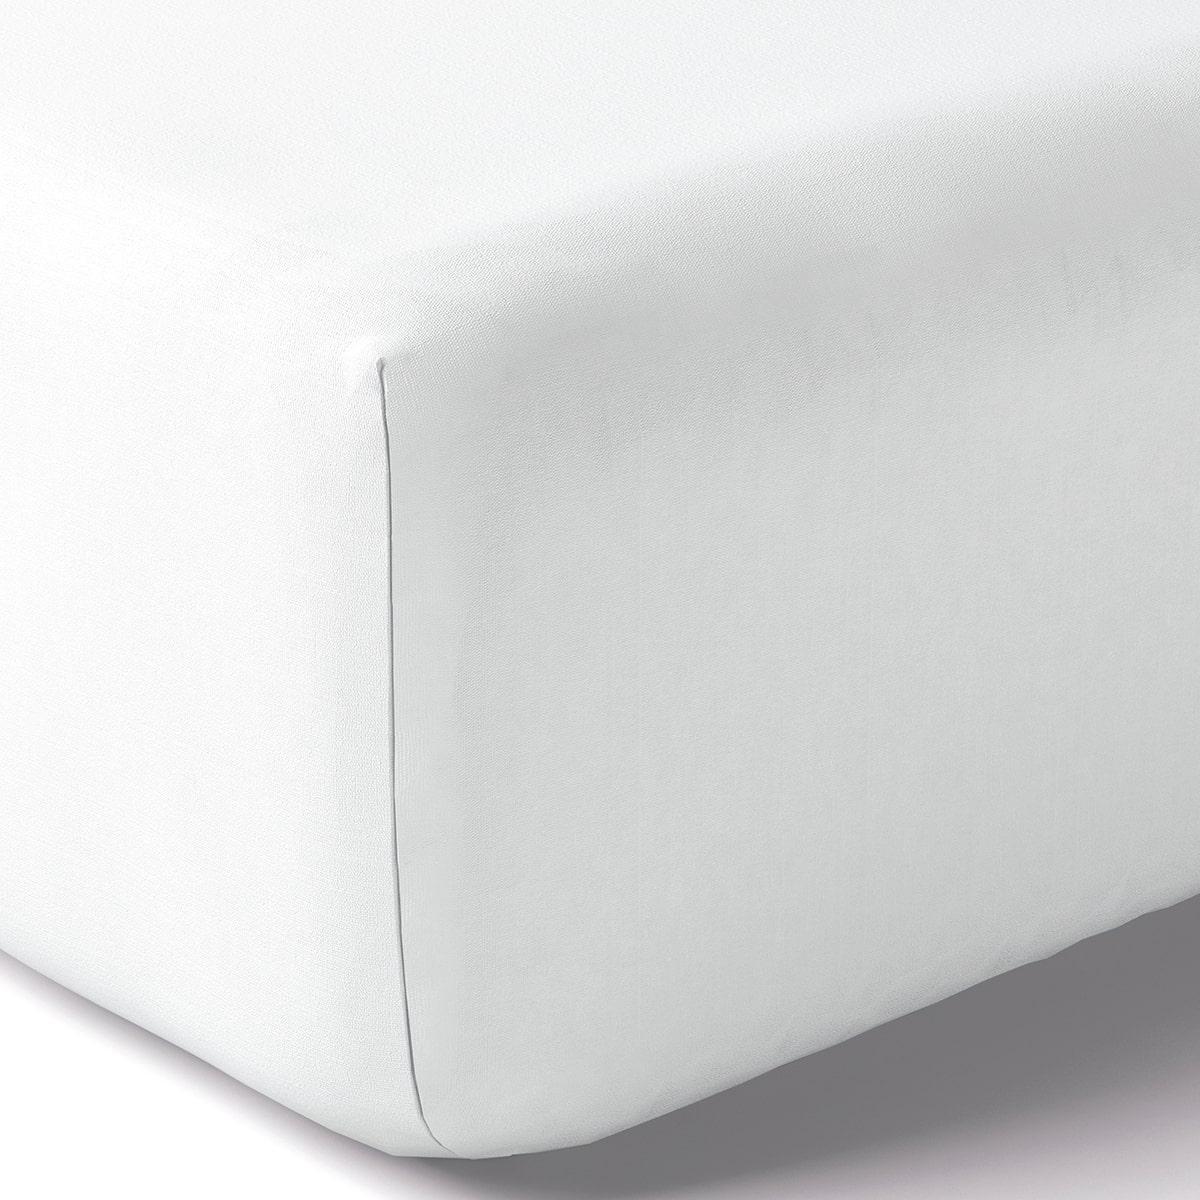 Drap housse coton 140x200 cm blanc